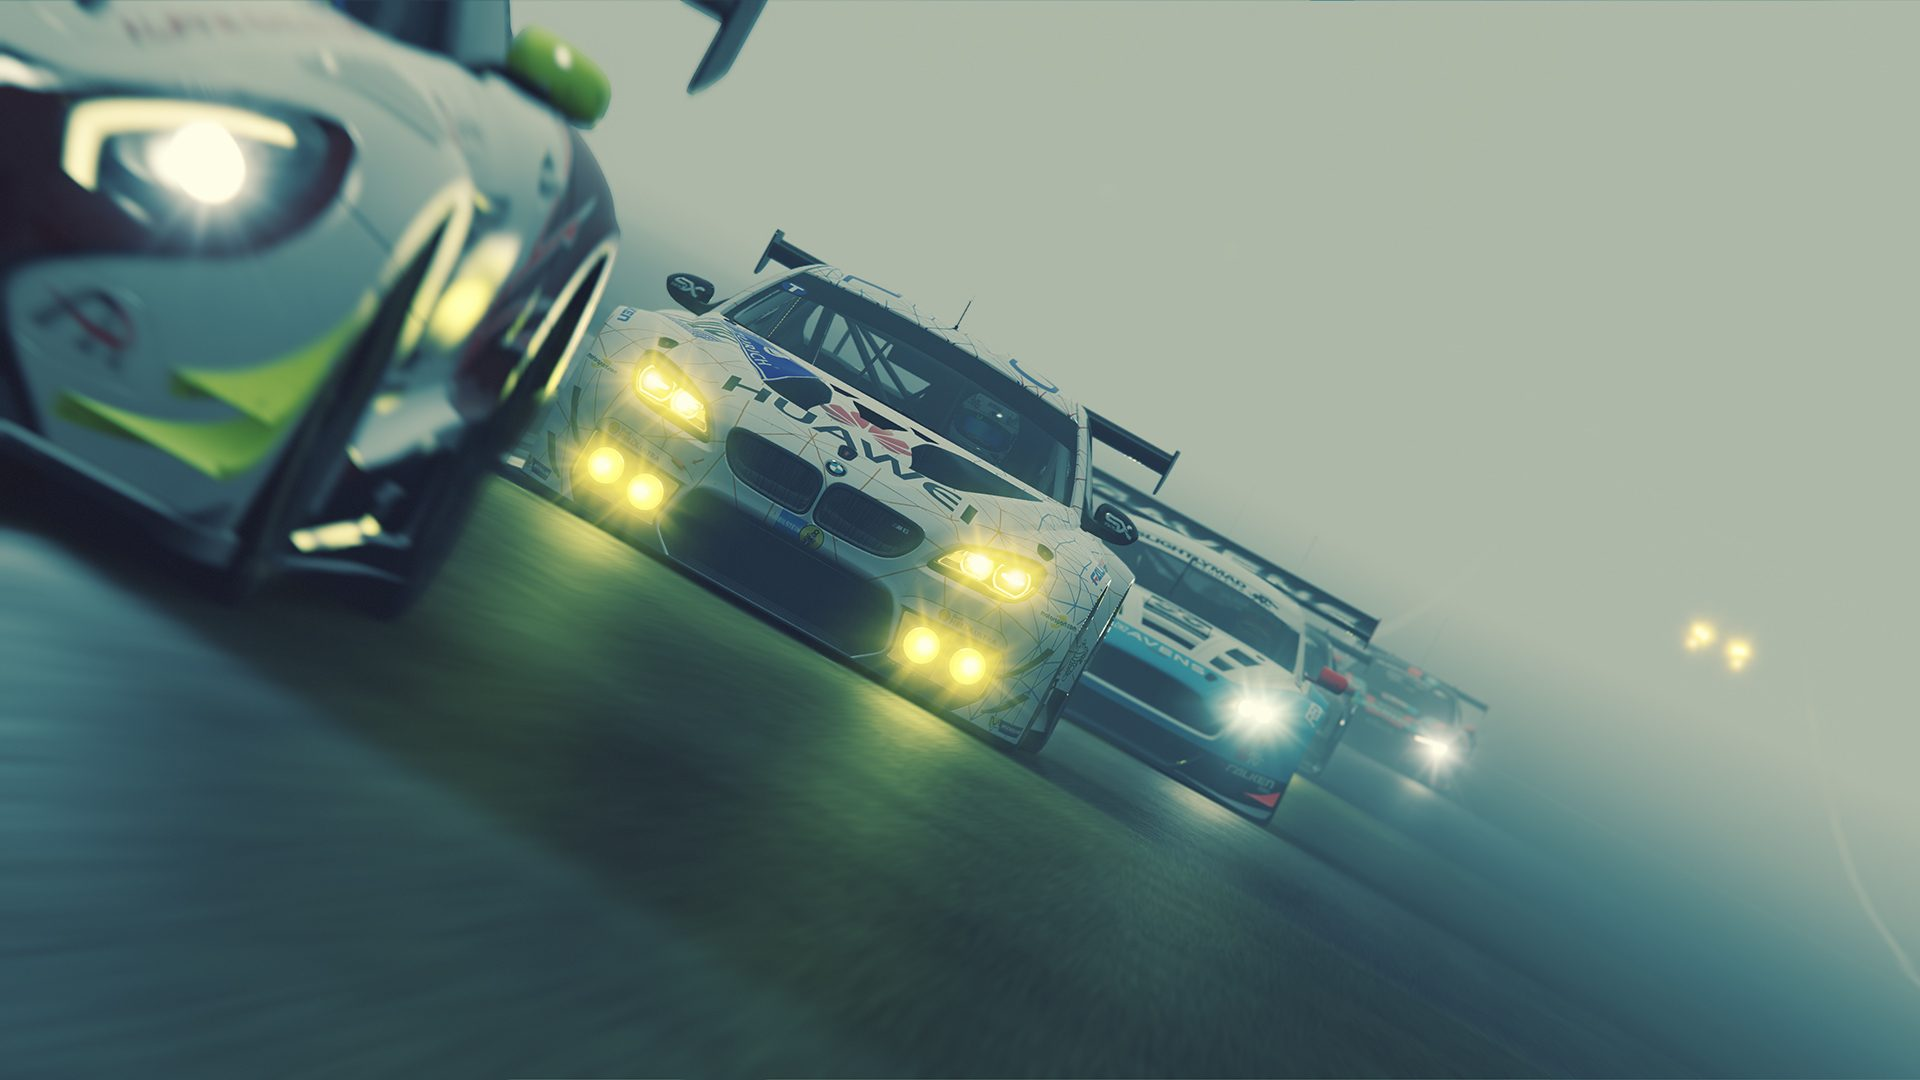 Project-CARS-2-BMW-M6-GT3-FlyPT.jpg